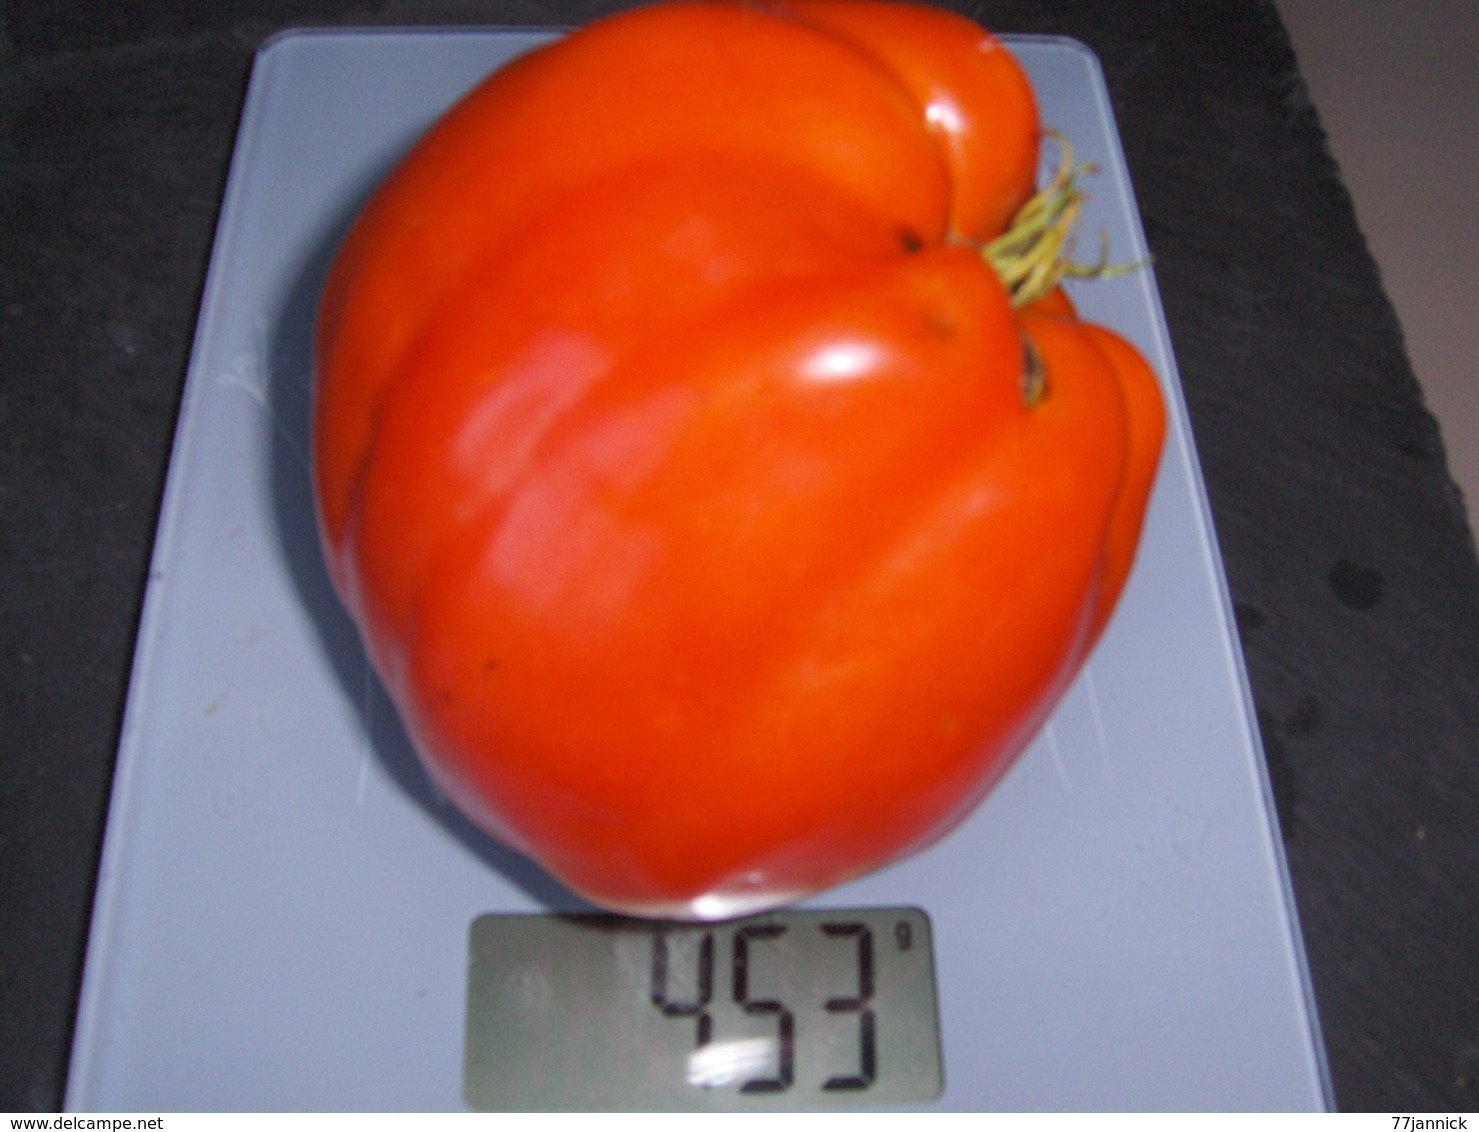 30 Graines Tomates COEUR DE BOEUF BIO - 2. Graines